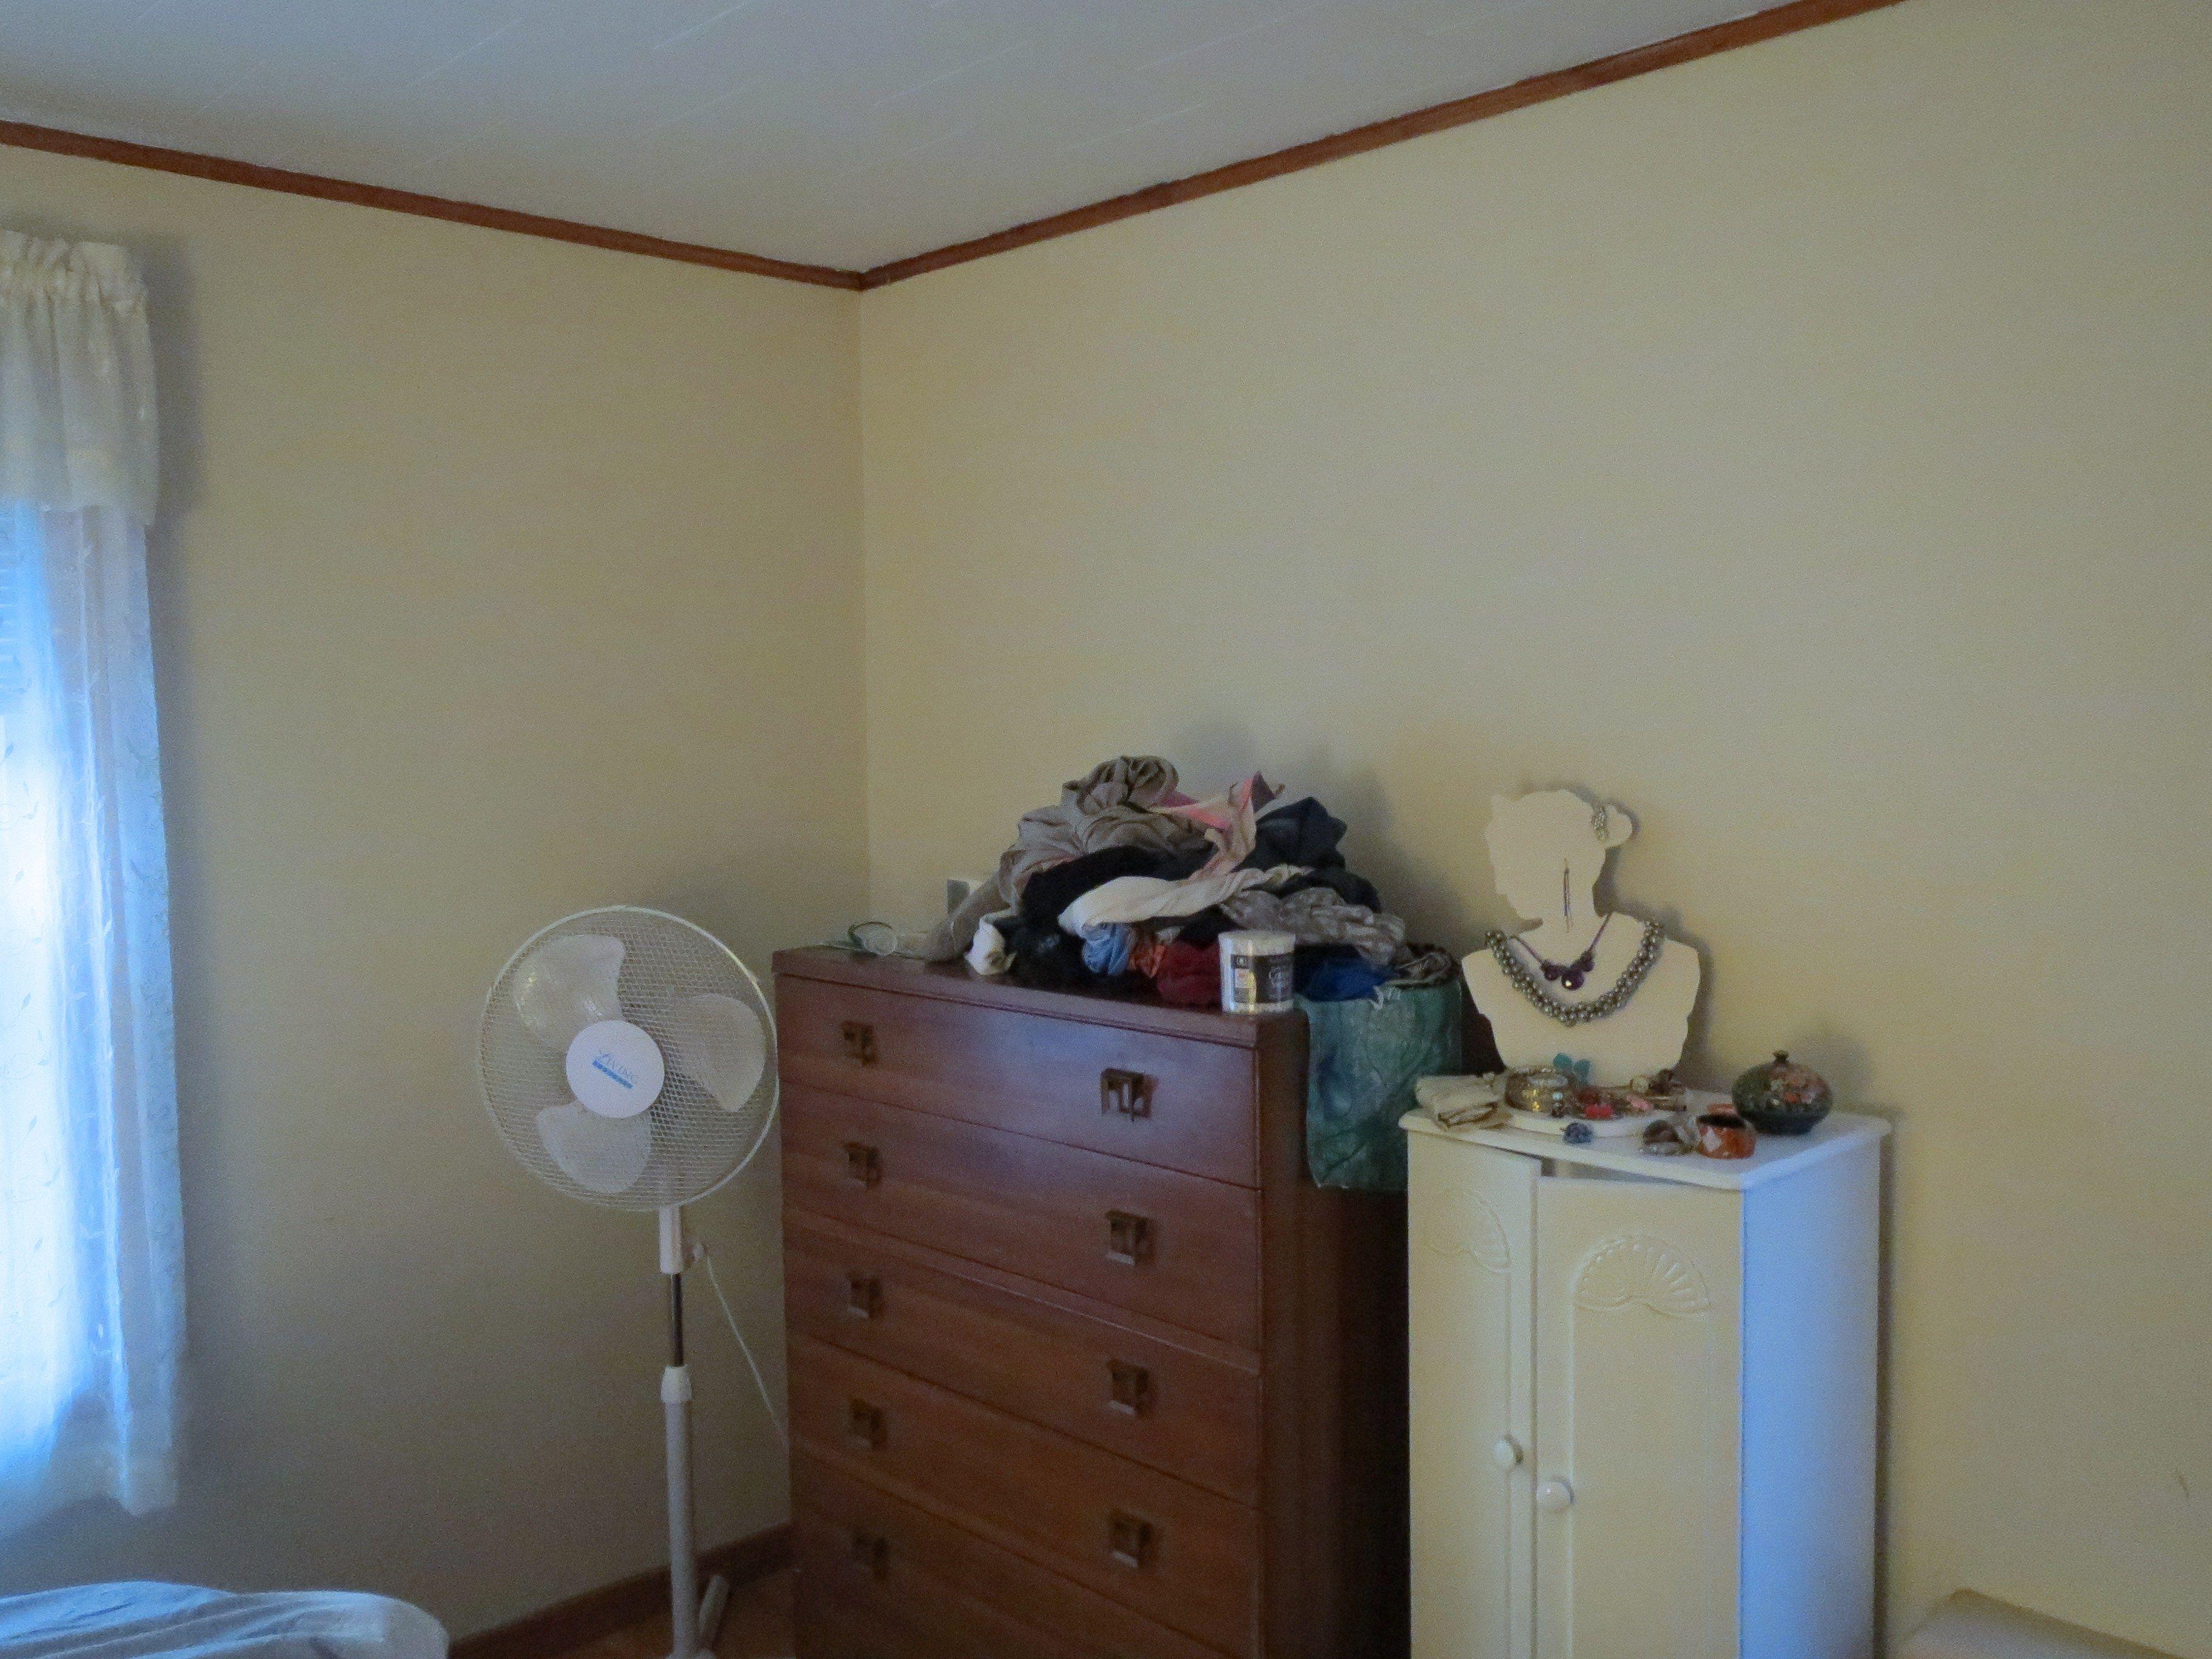 Bedroom before -- Plaster & Disaster